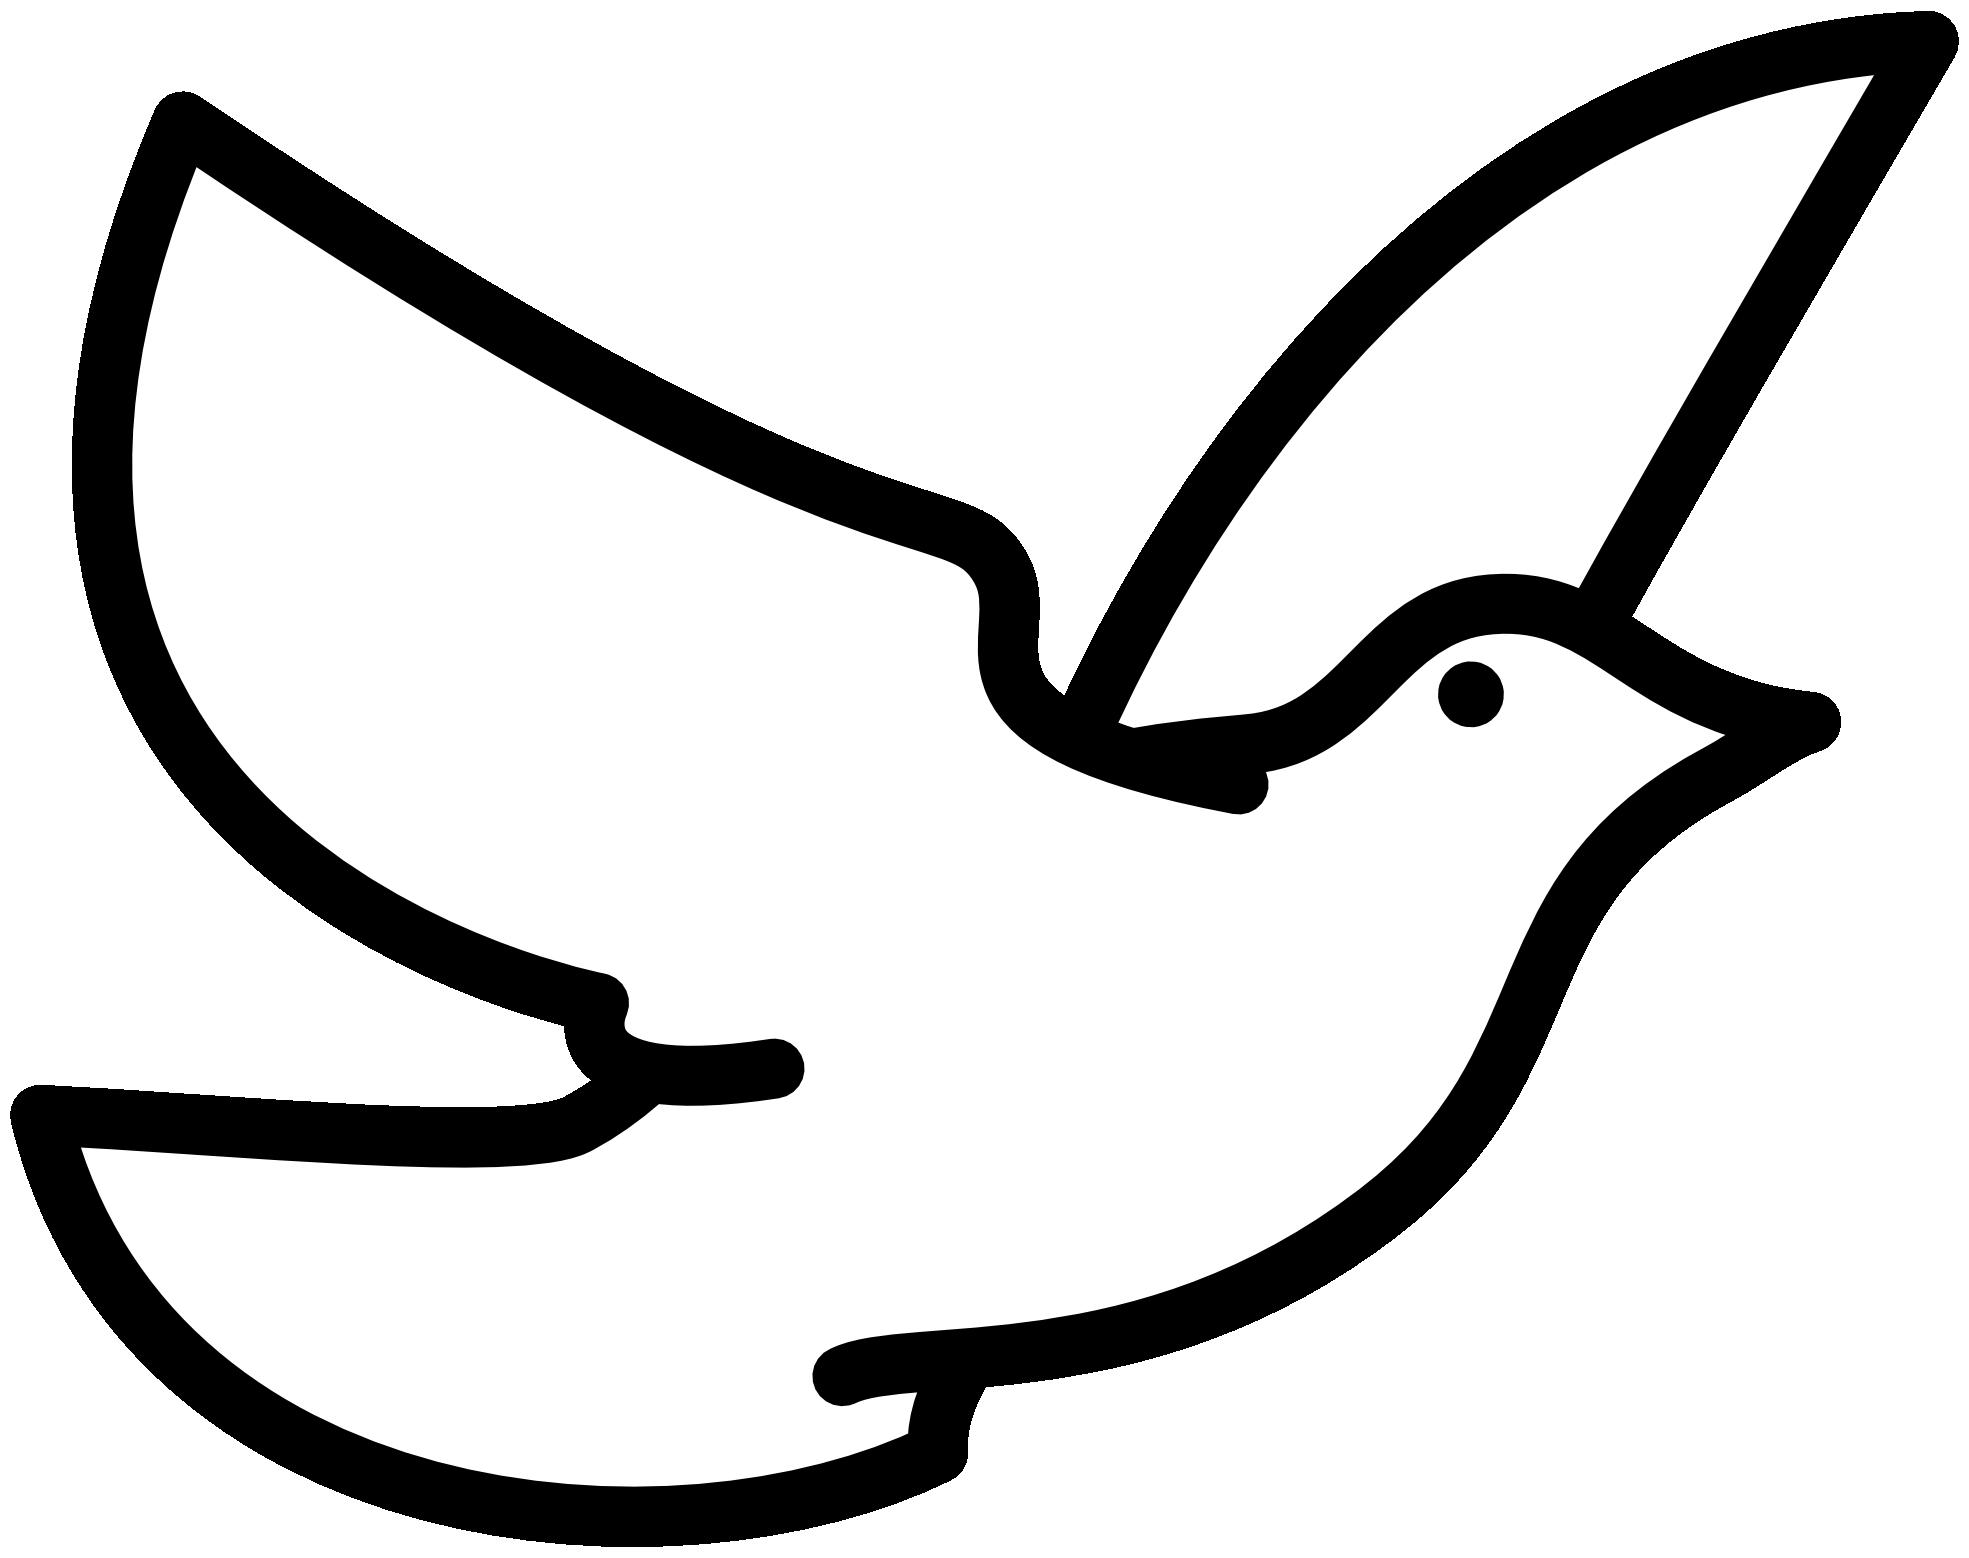 Flying bird line art clipart.